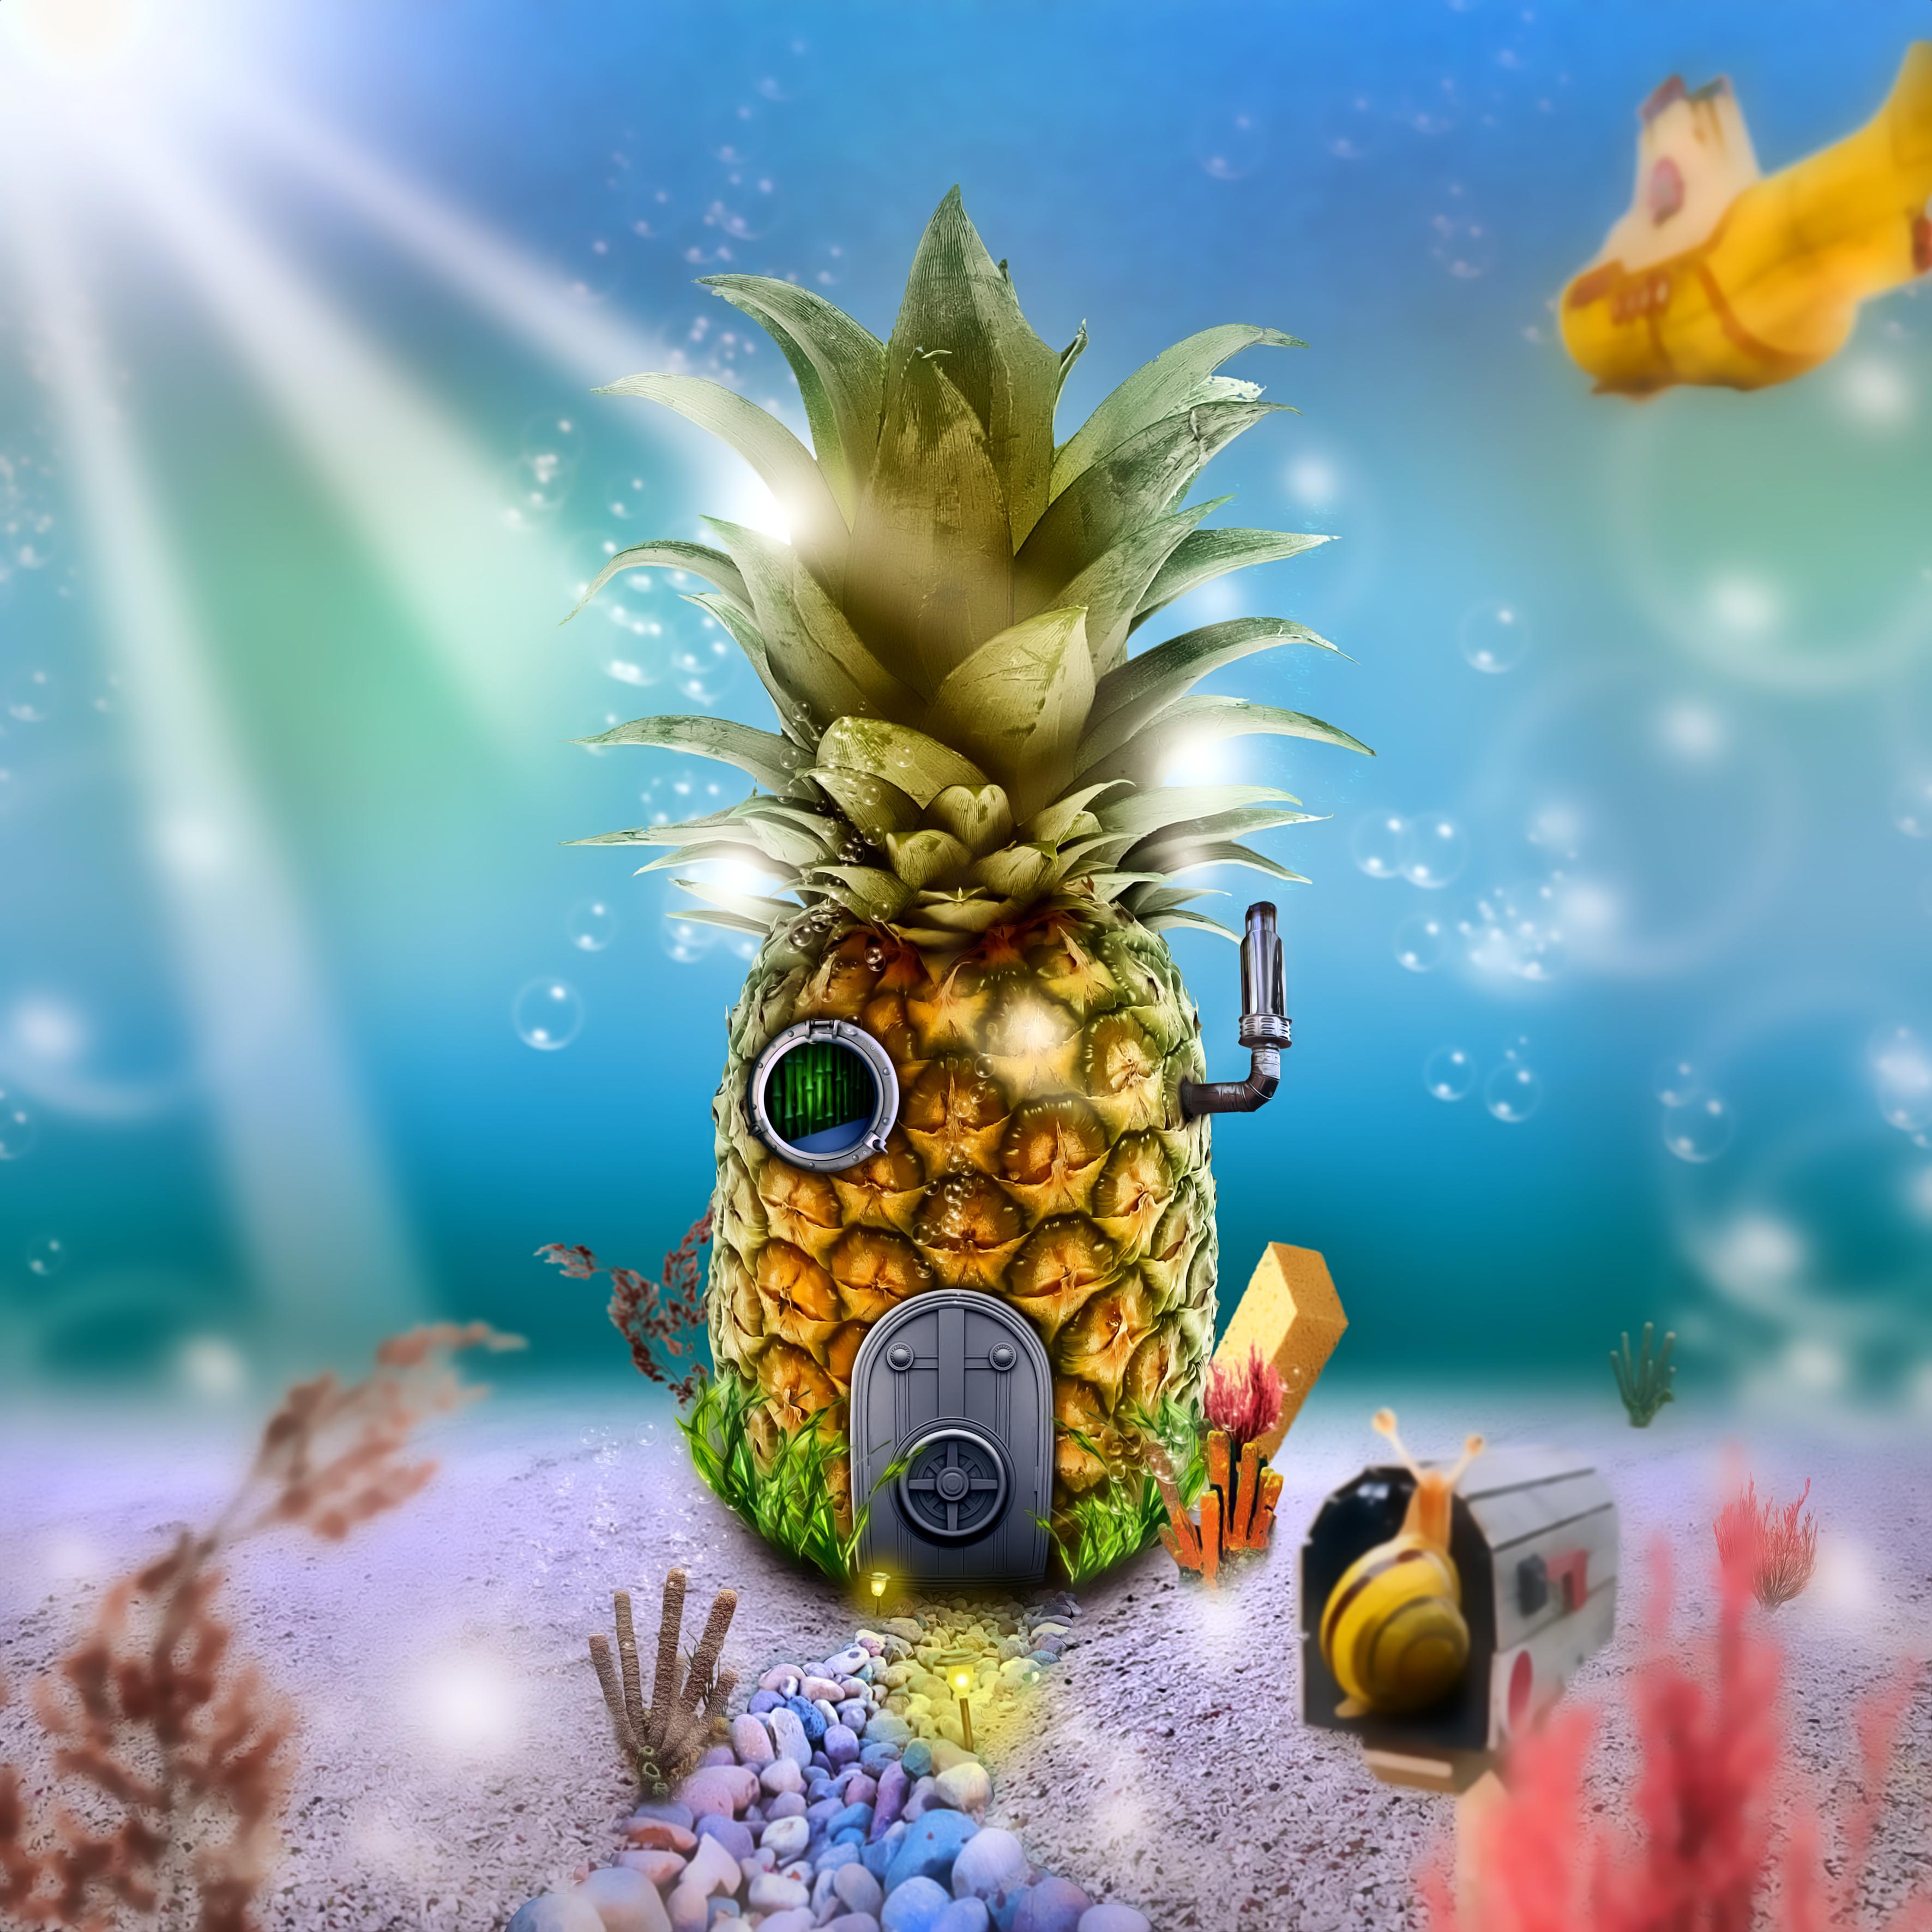 Real Spongebob s House by T-DesainReal Spongebob House